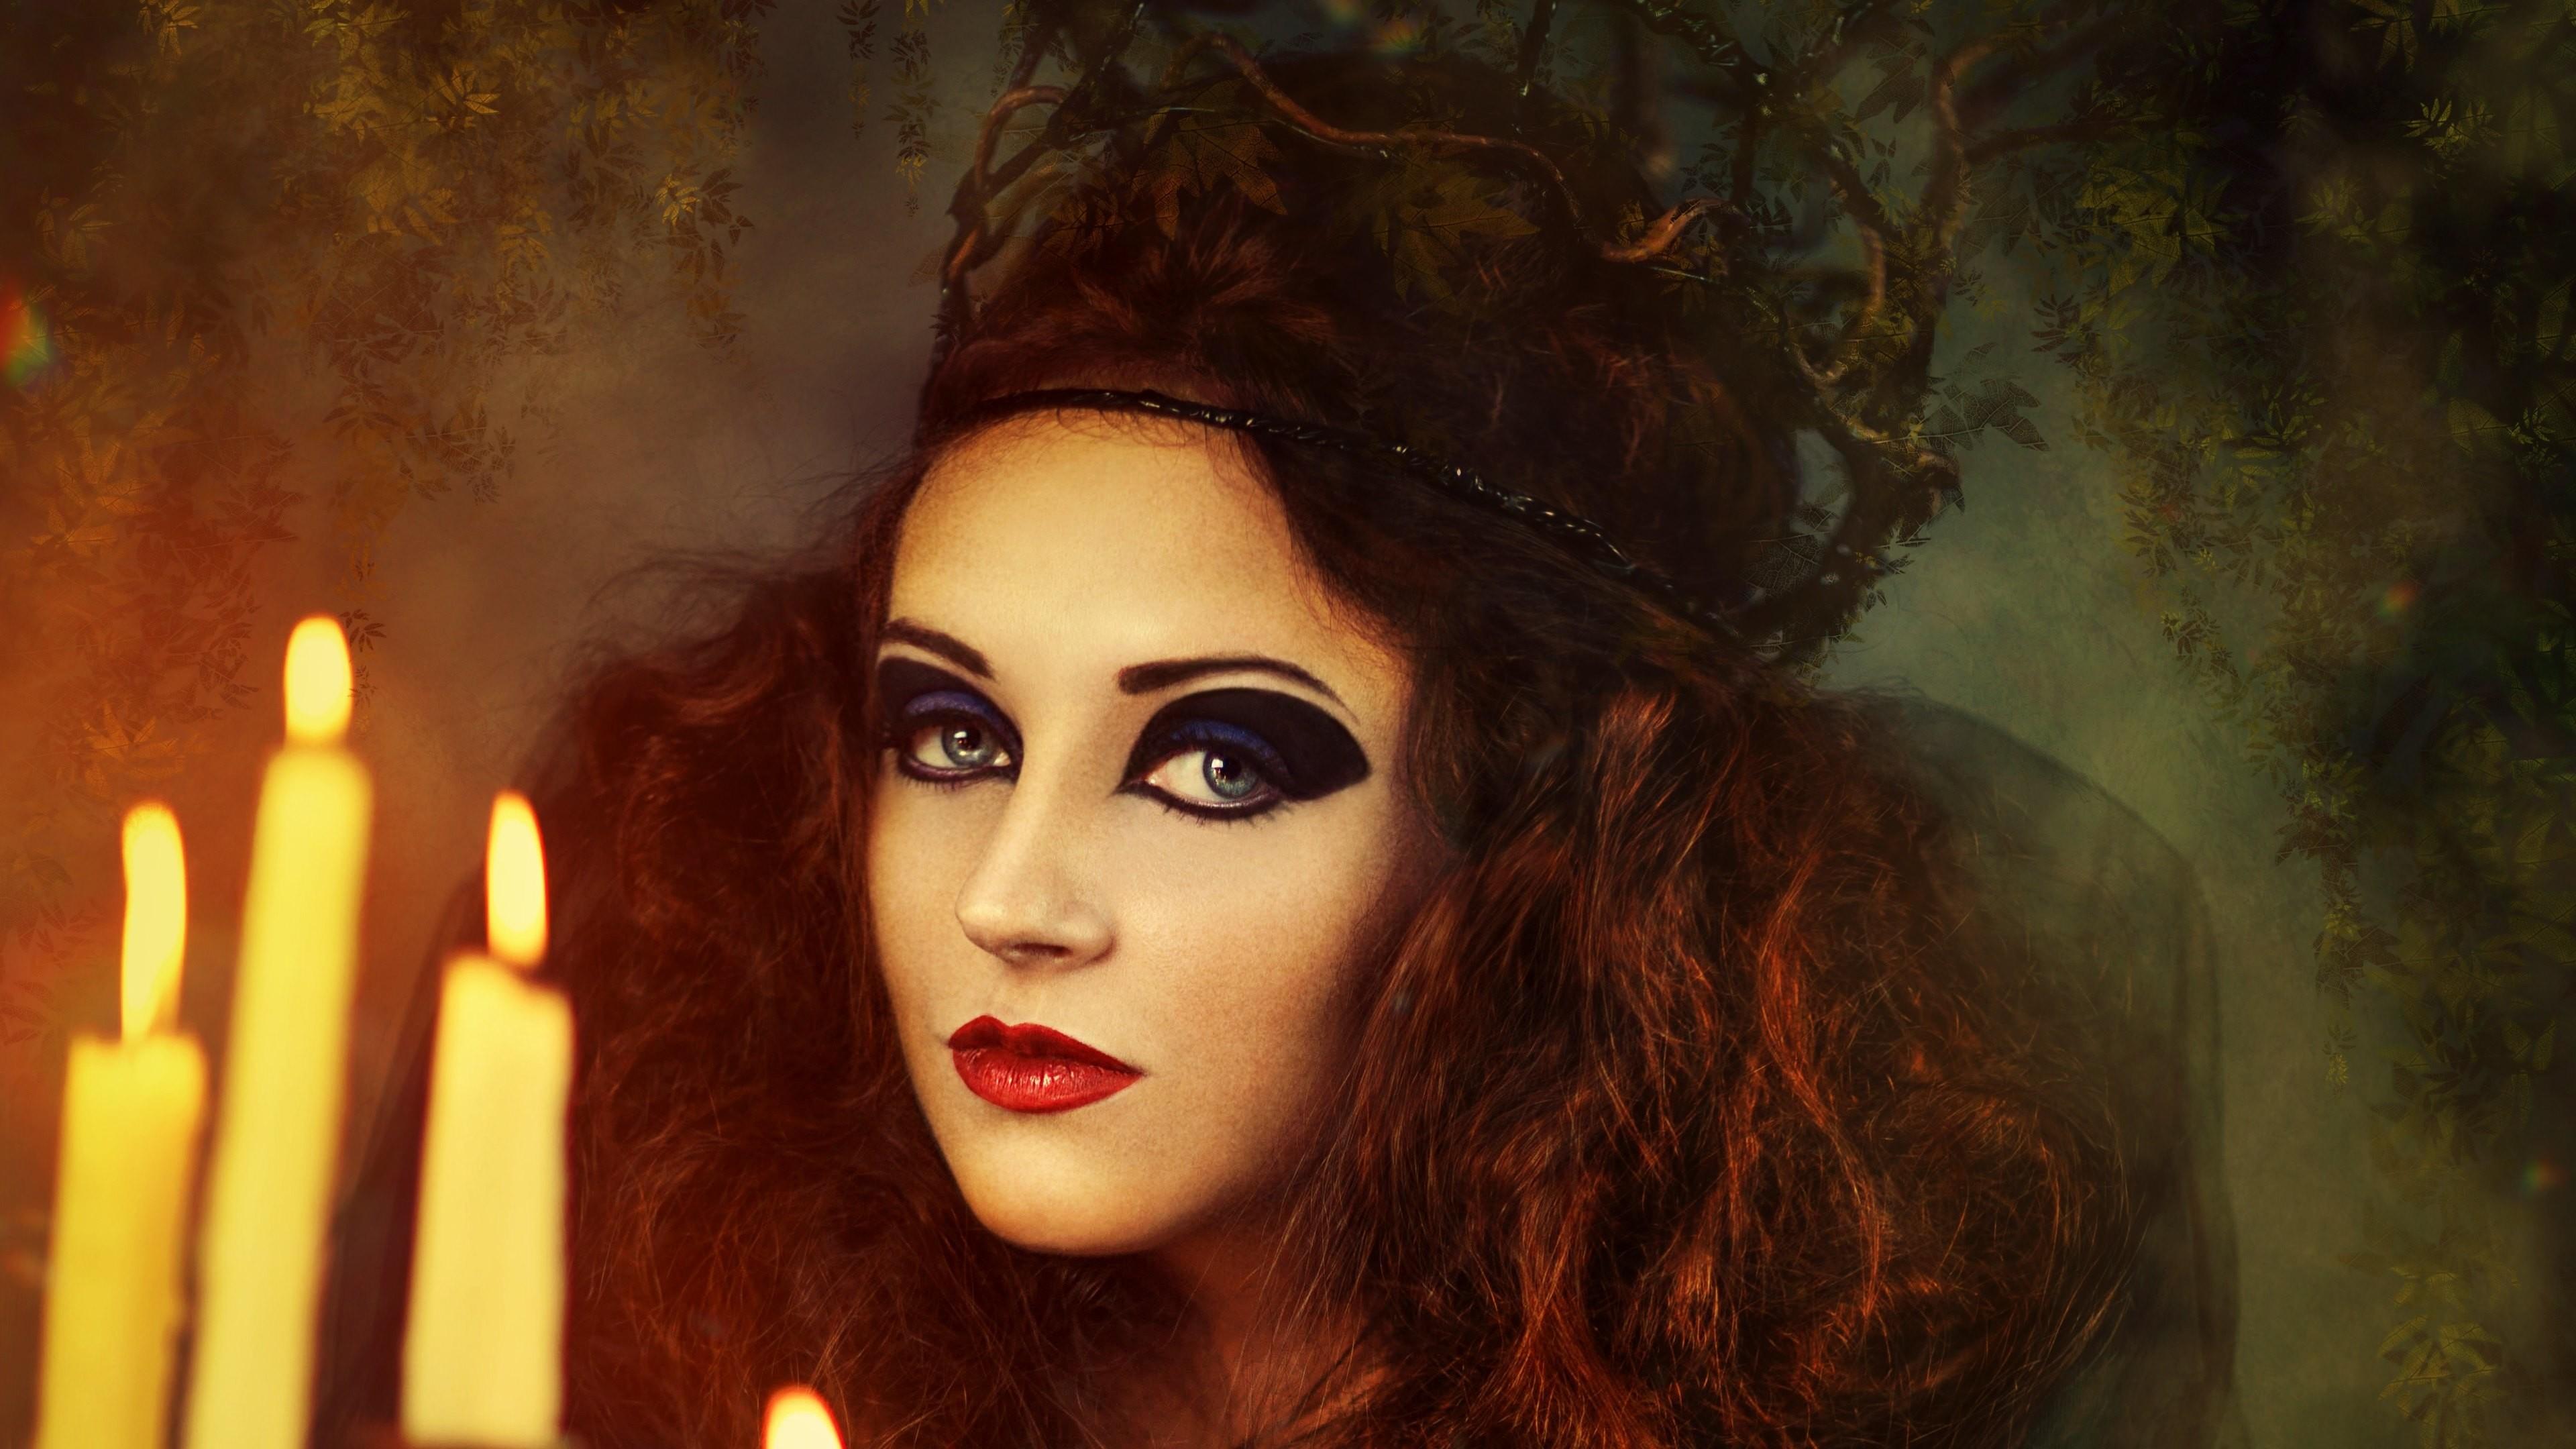 Wallpaper: Witch. Vampire. Girl Halloween Costume. Ultra HD 4K 3840×2160